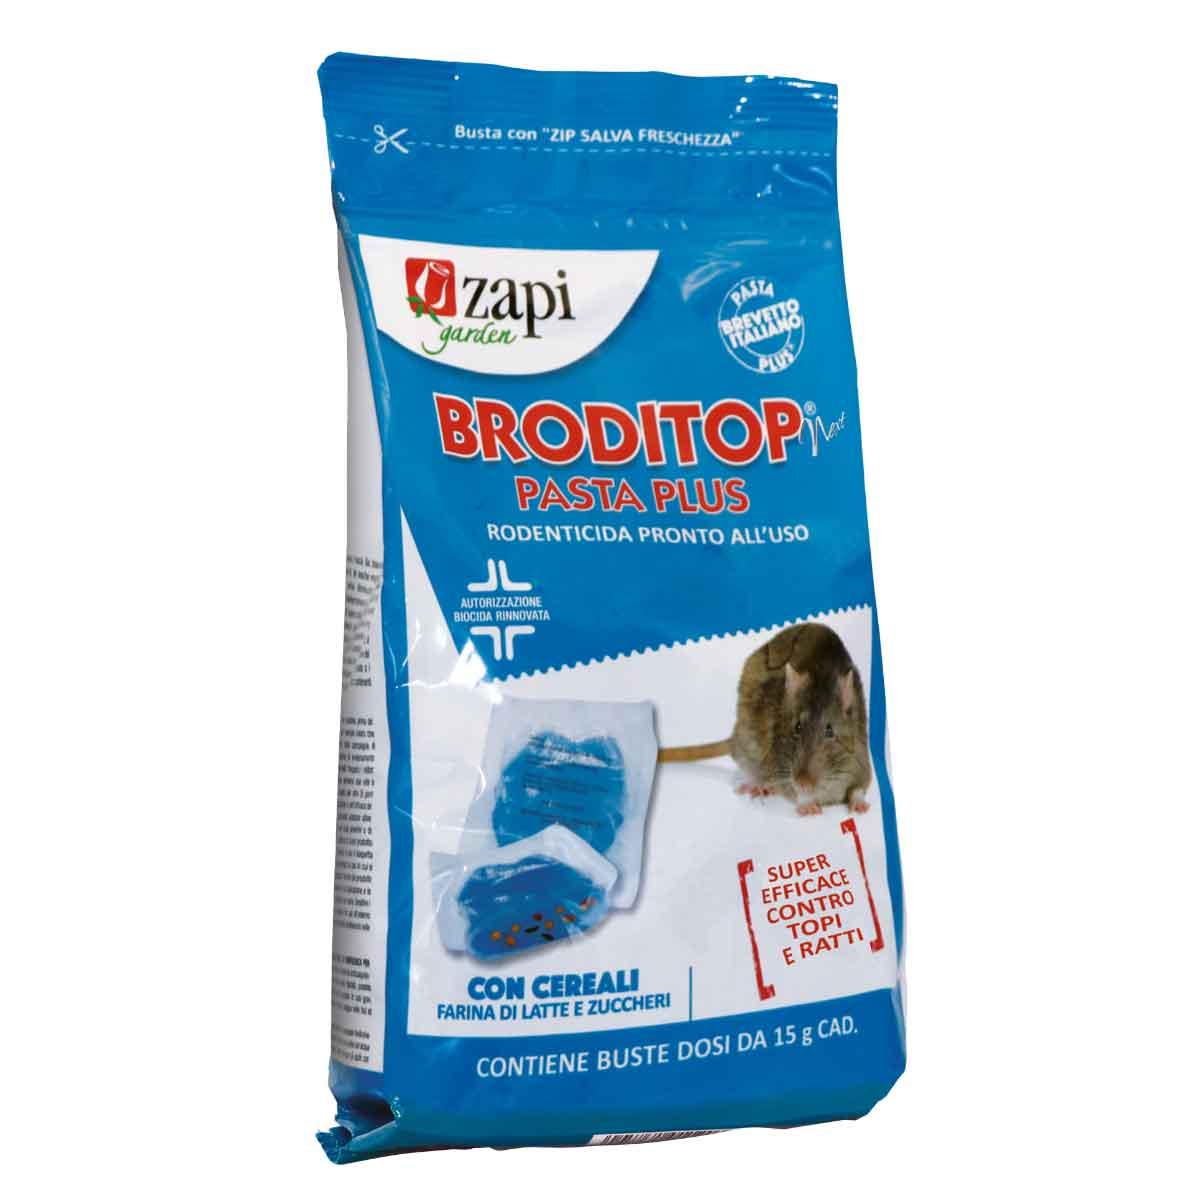 Zapi Topicida Broditop Next Pasta Plus 150g